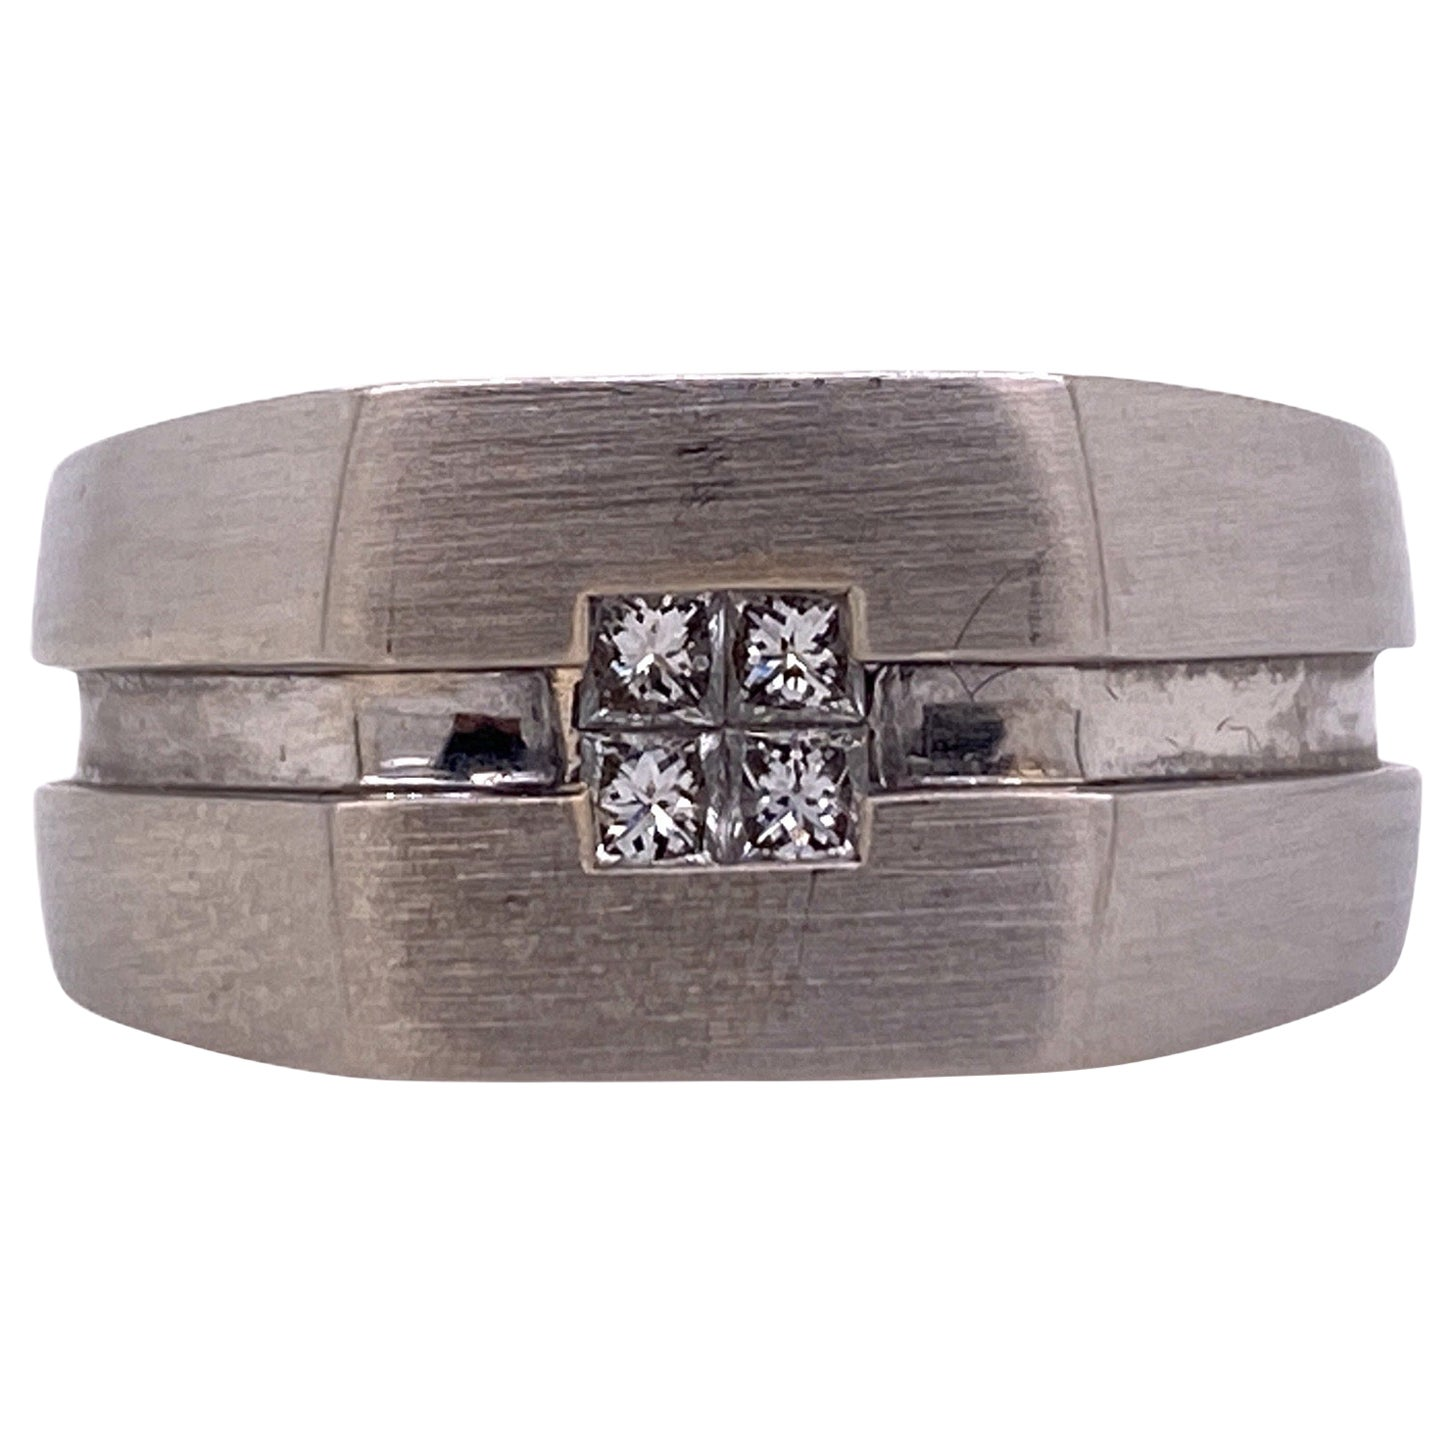 Effy Men's Diamond 14 Karat White Gold Wide Band Ring